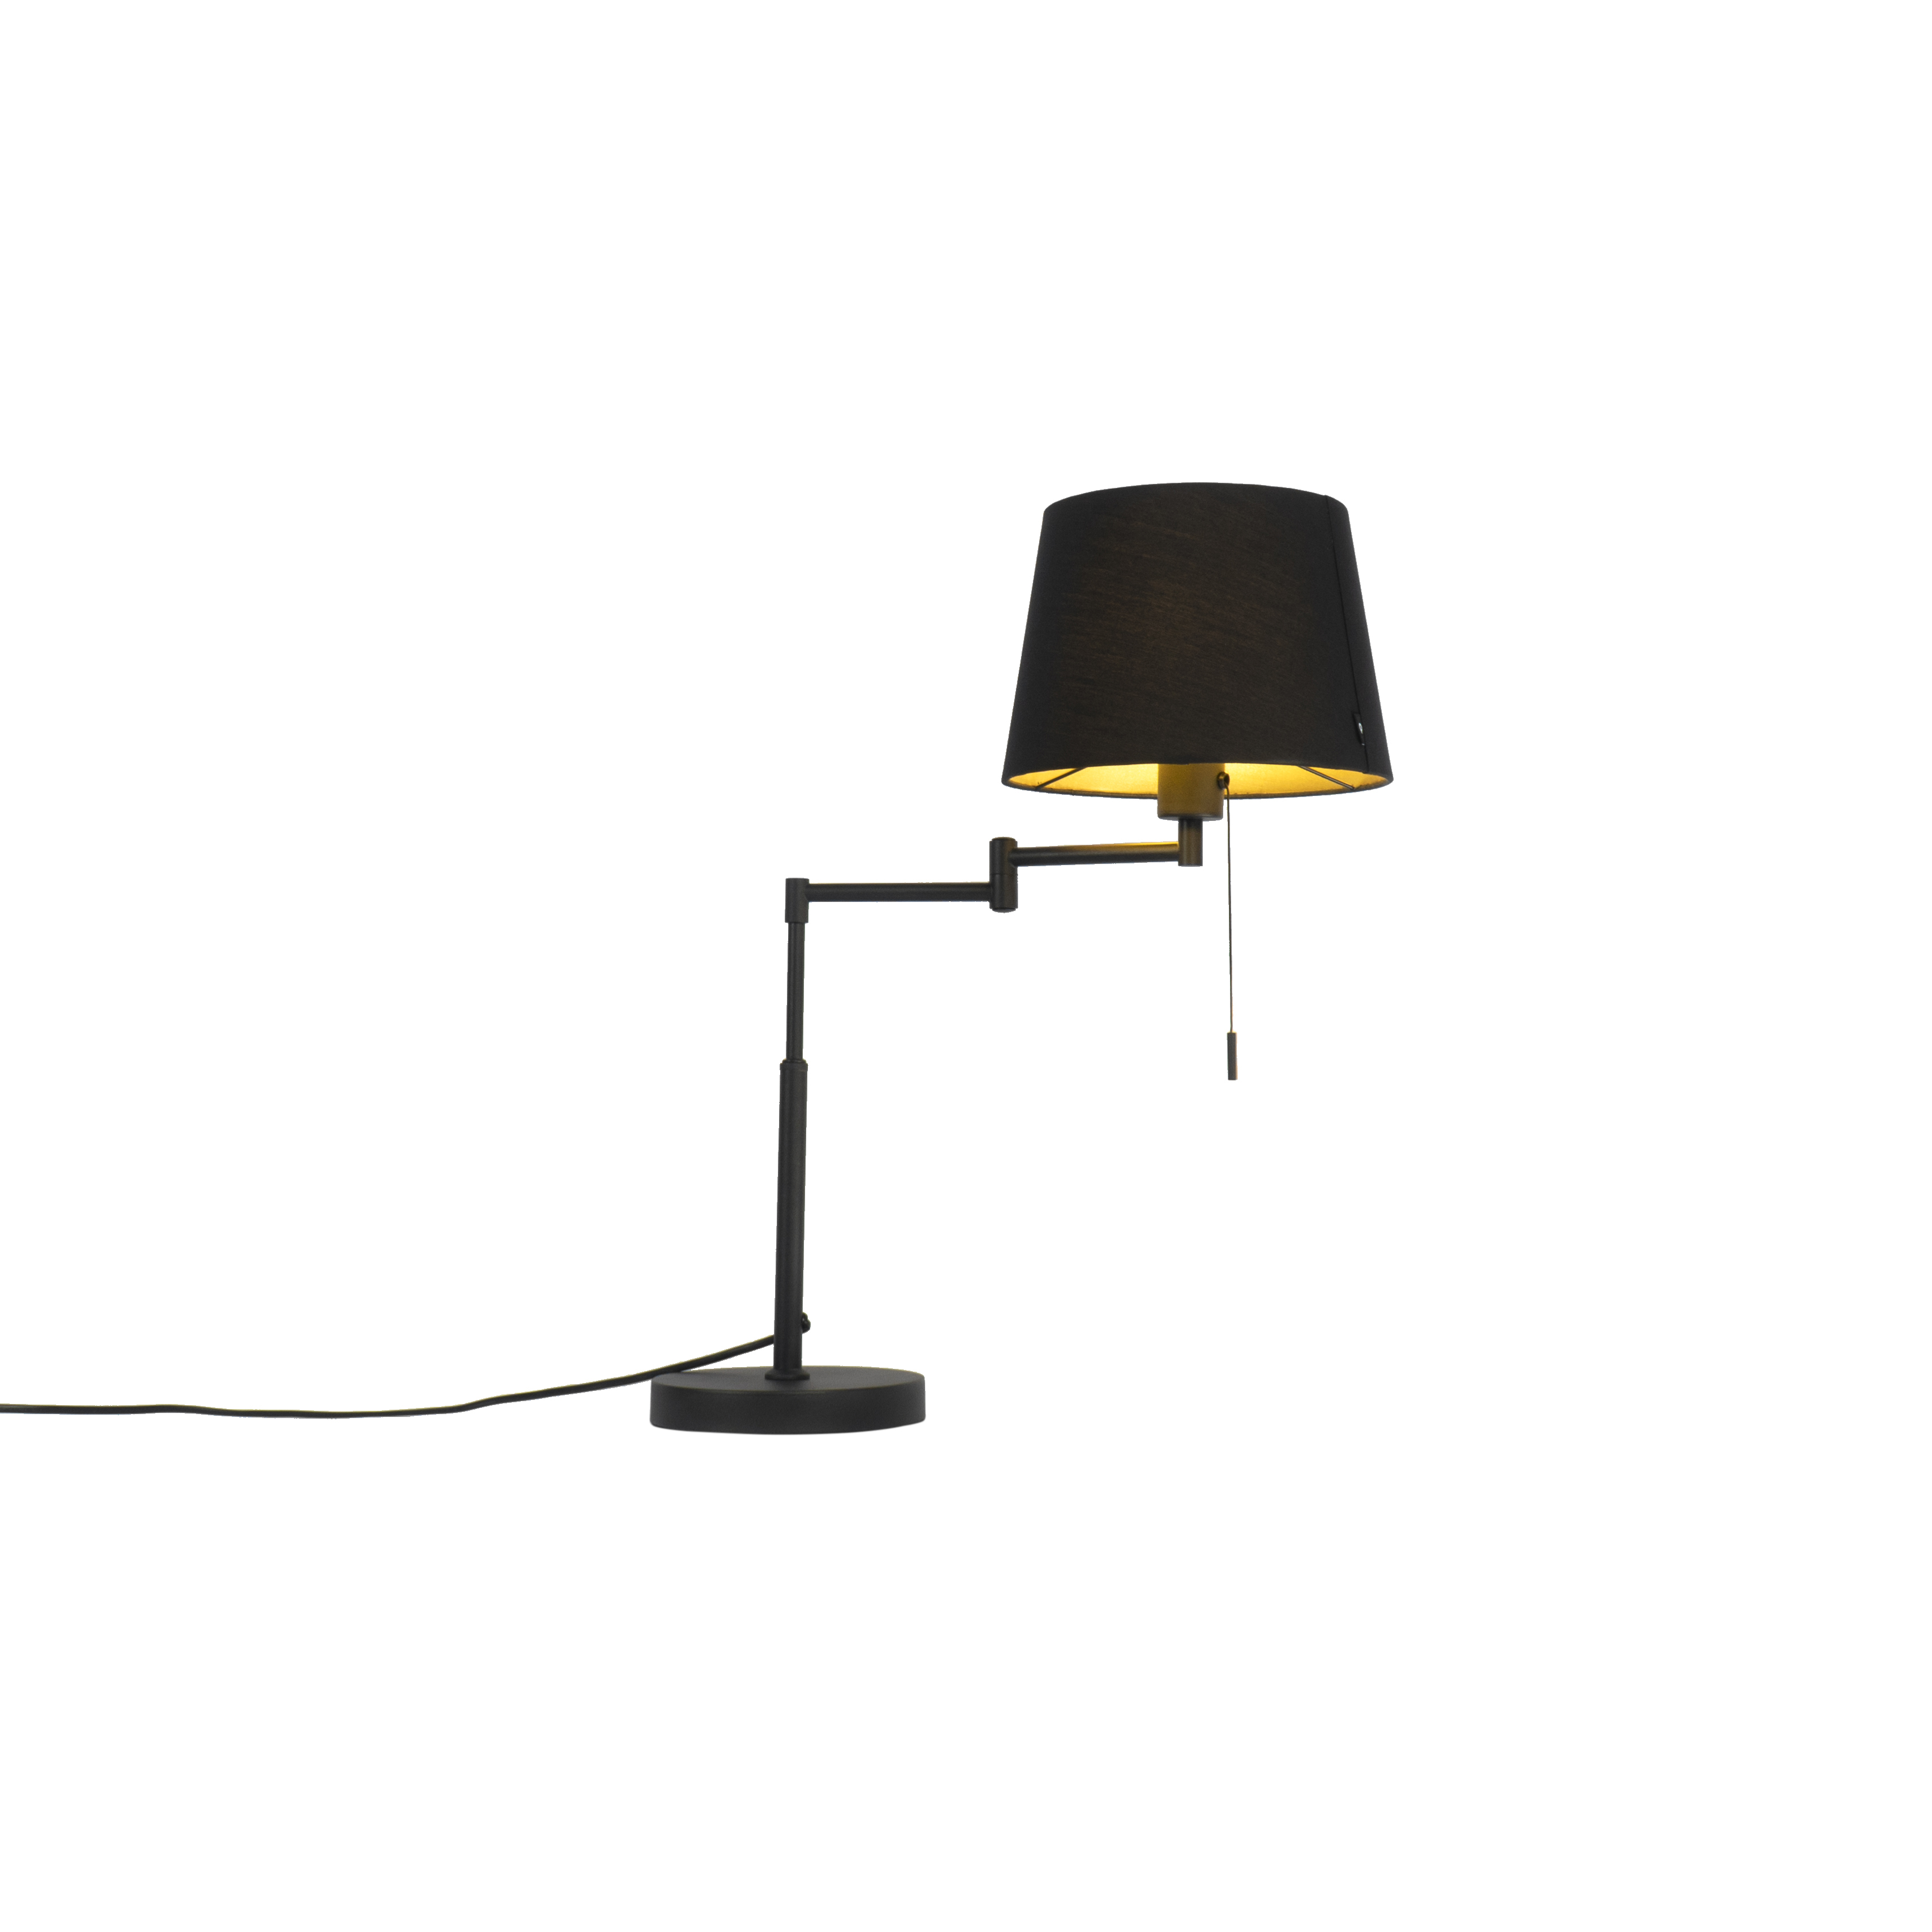 Tafellamp zwart met zwarte kap en verstelbare arm - Ladas